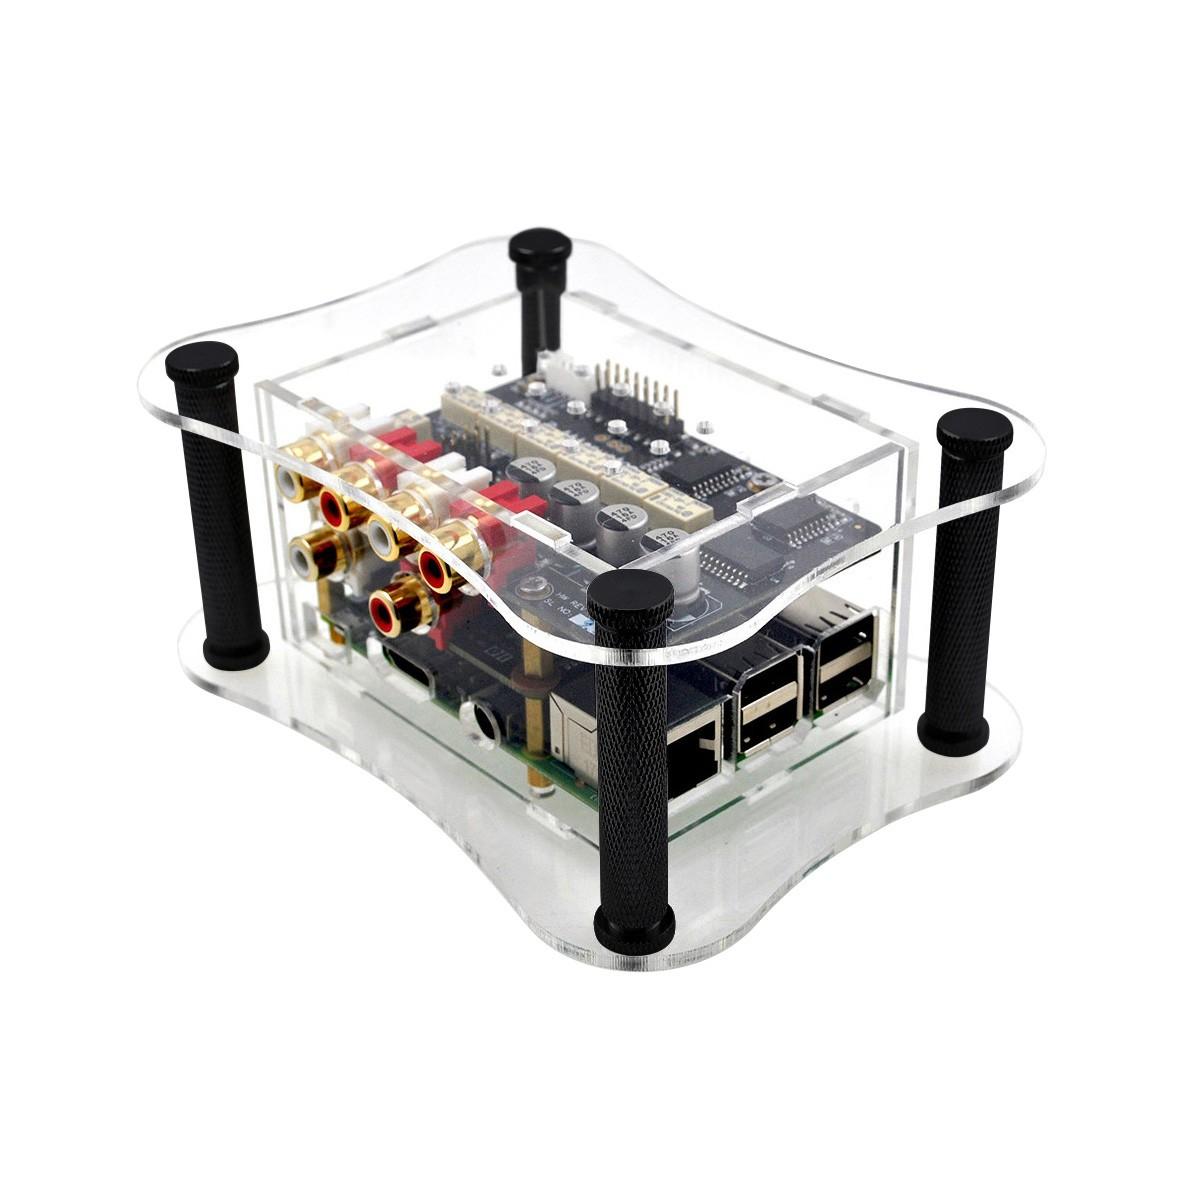 ALLO Boîtier Acrylique Transparent pour Raspberry 2 / 3 + DAC Boss + Relay Attenuator